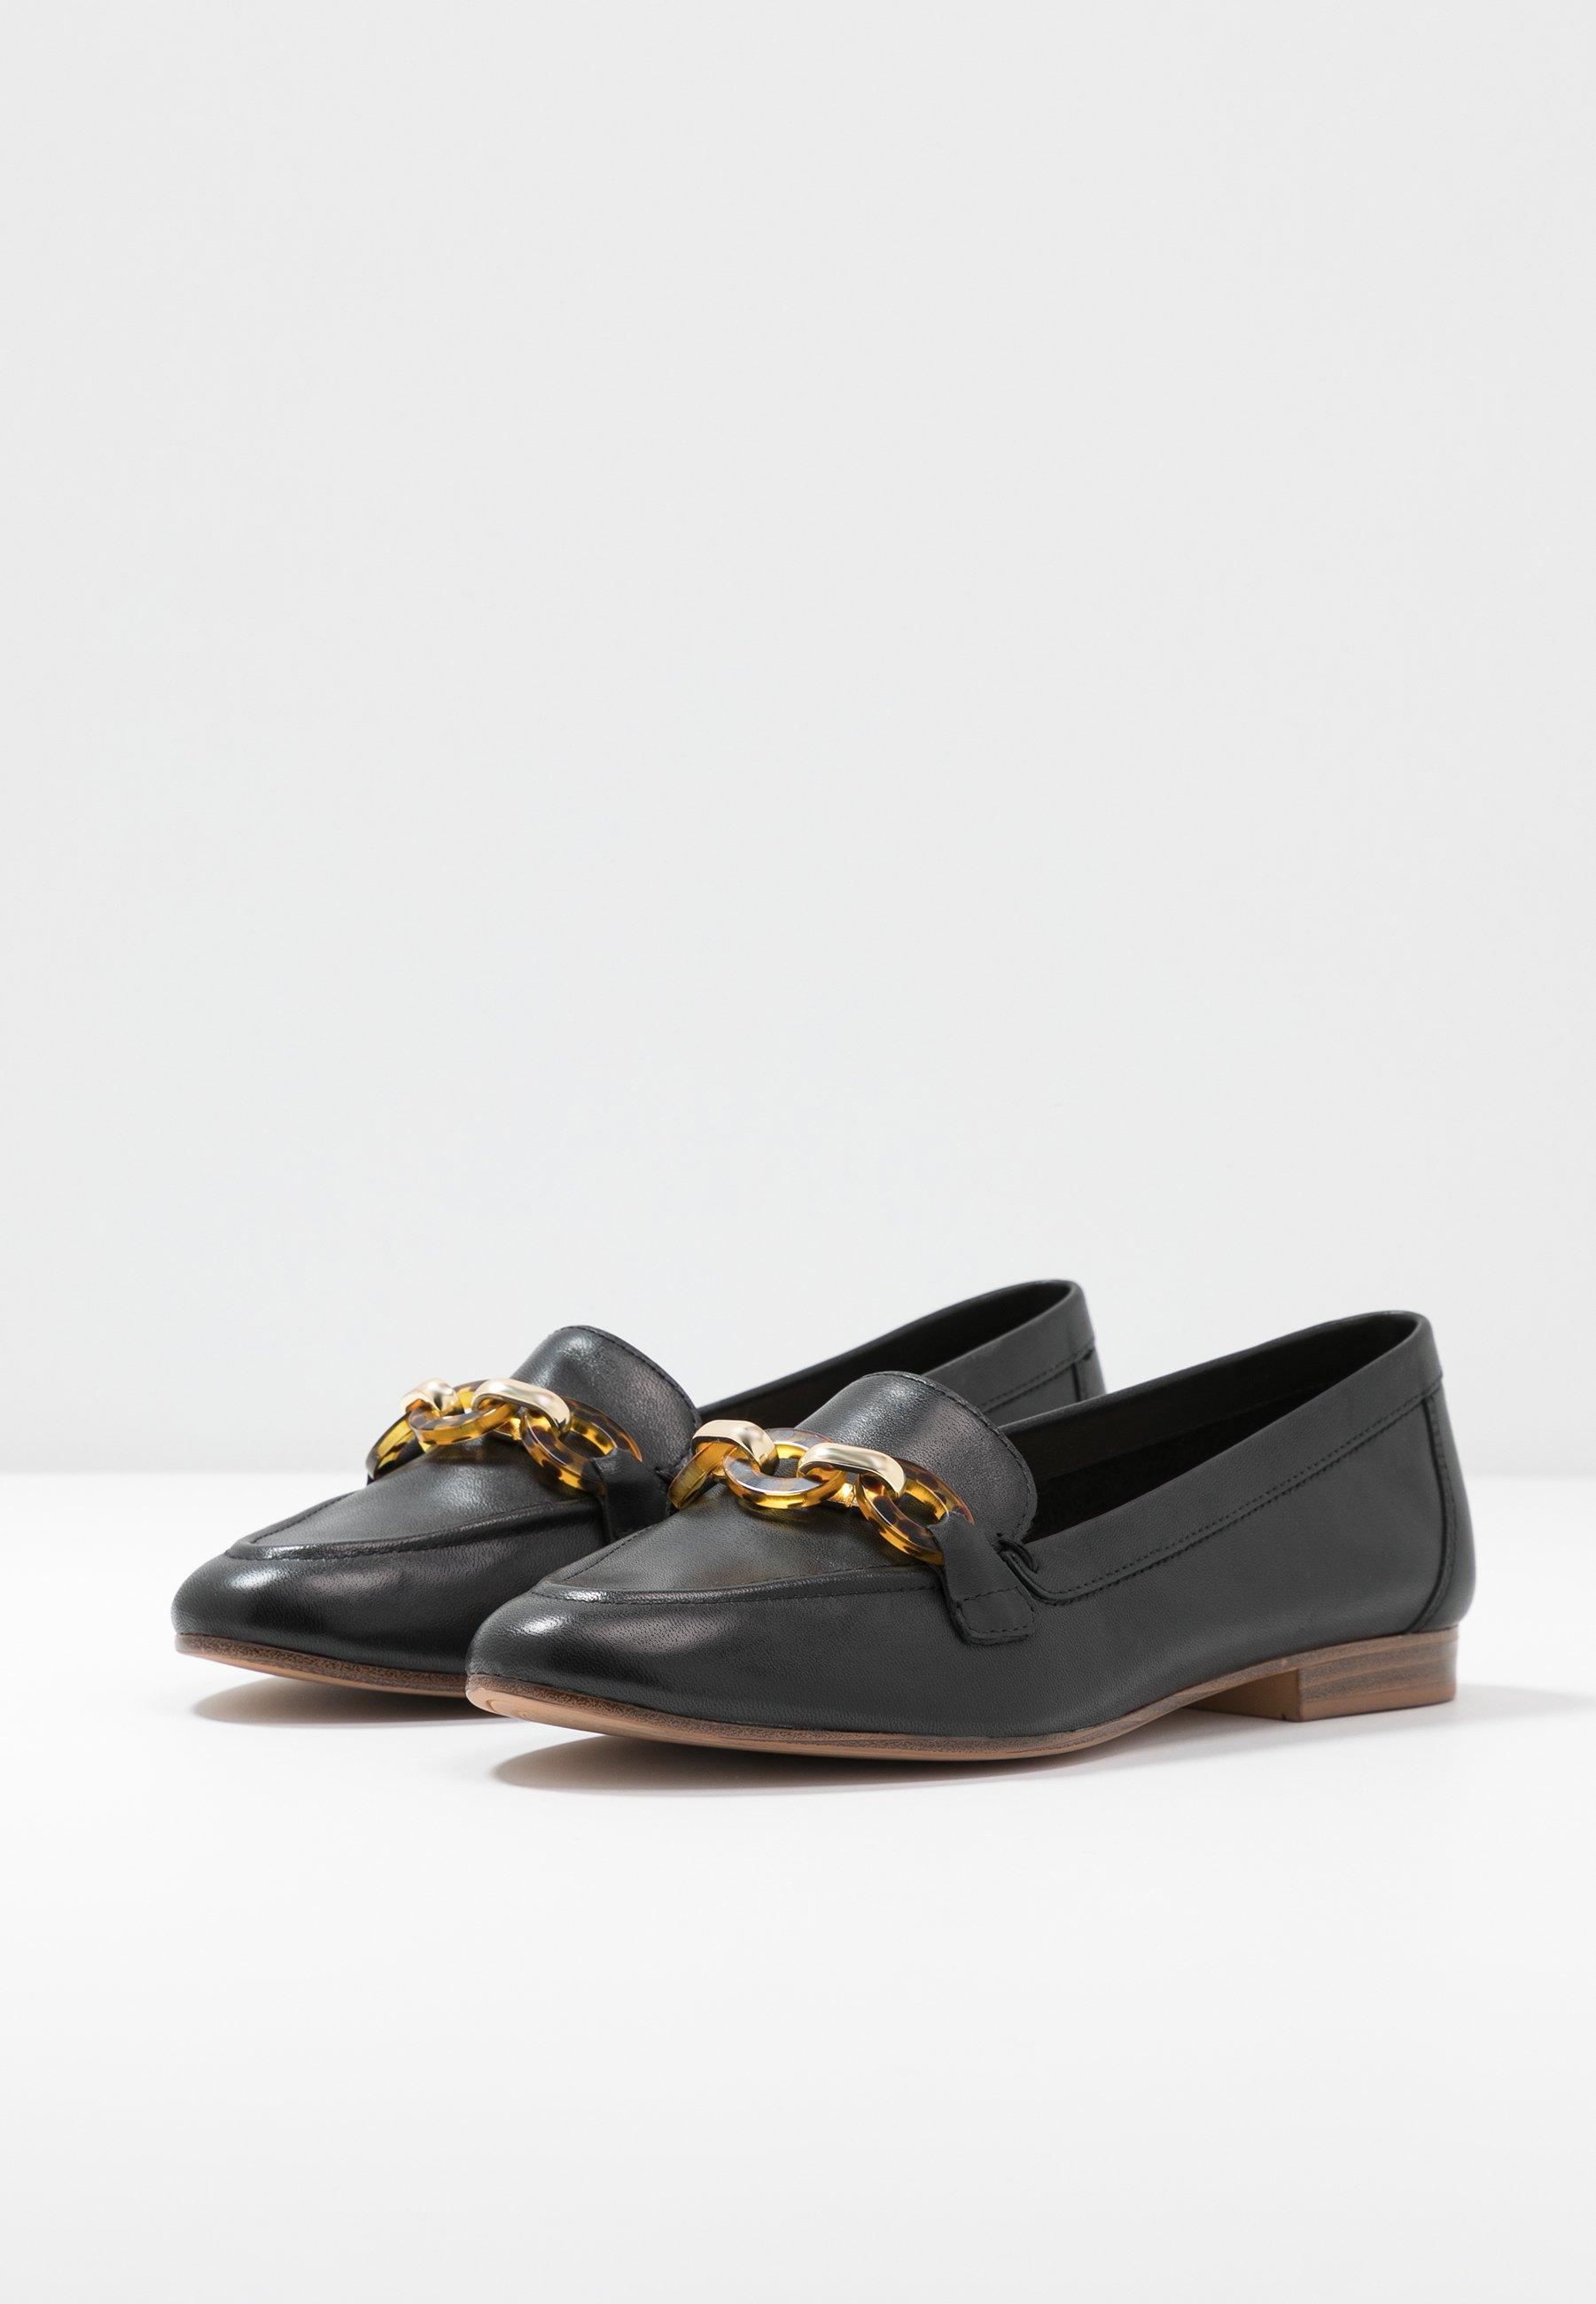 Aldo Gwaulith - Slippers Black